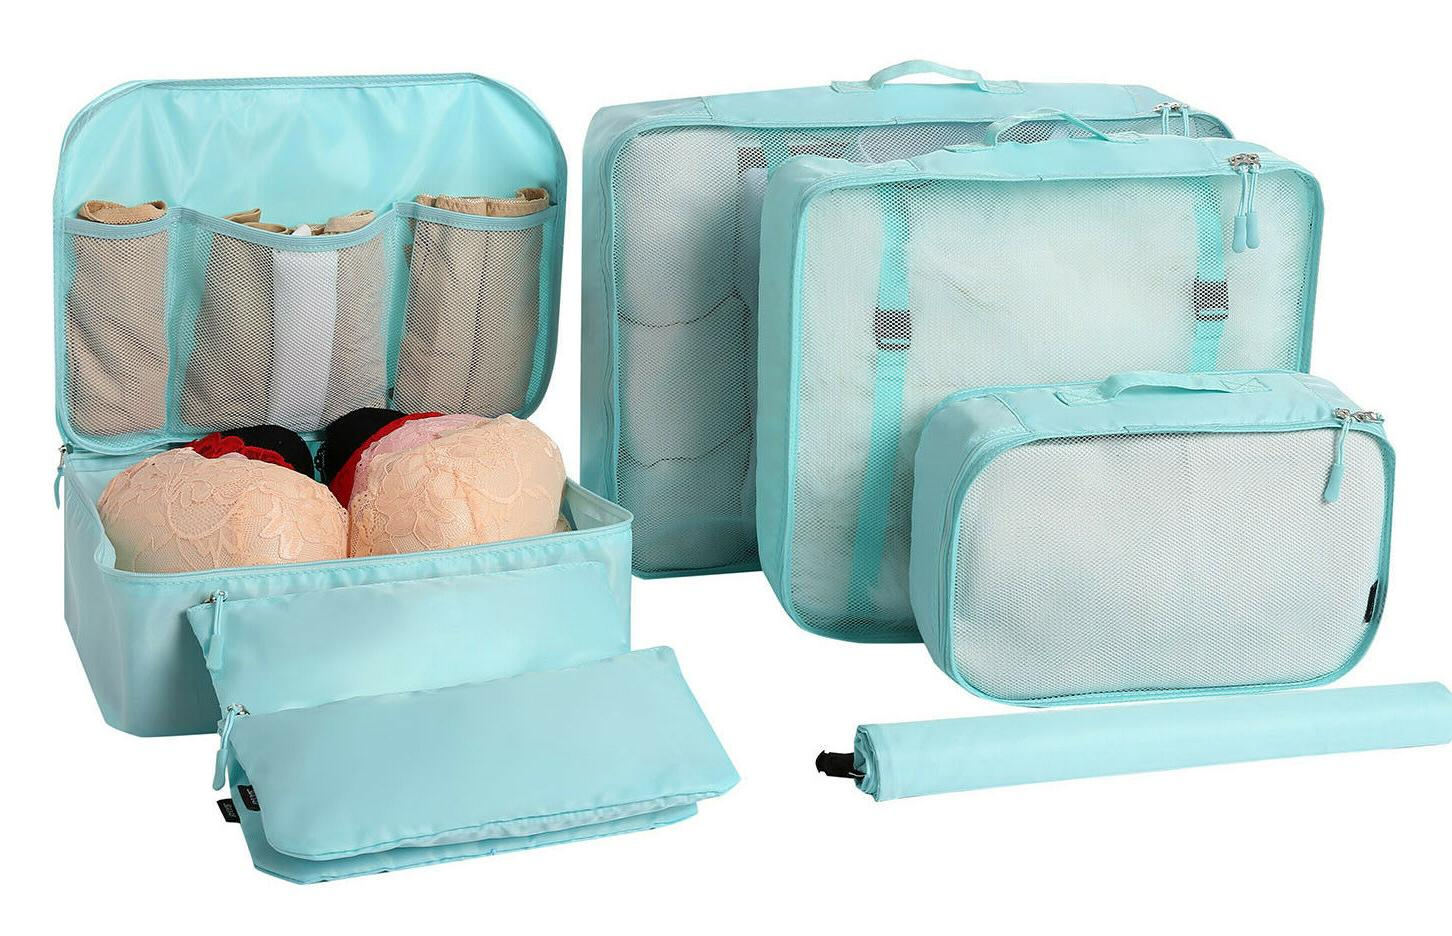 7 pcs lightweight luggage packing organizers storage